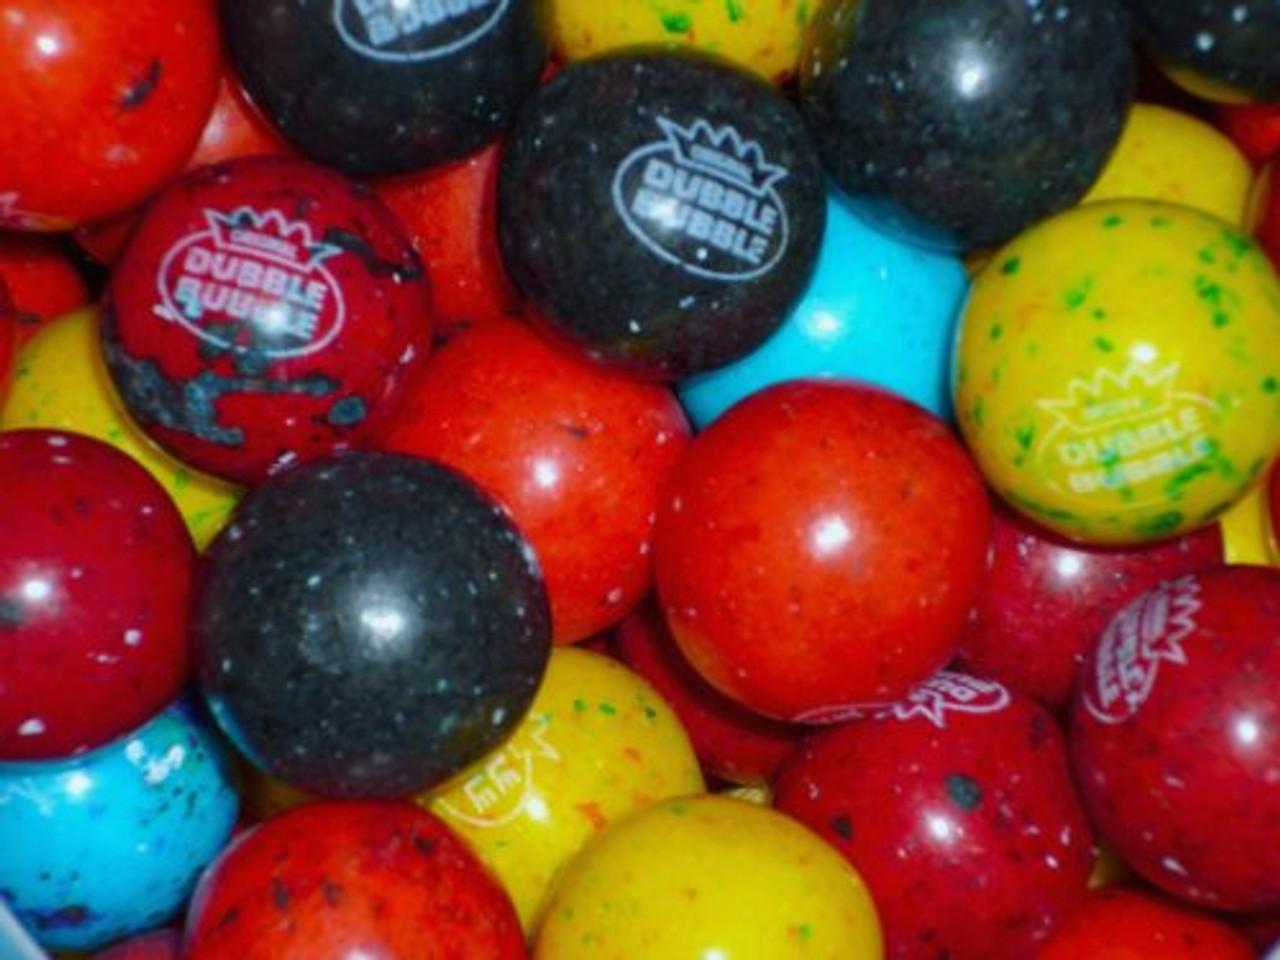 2 Bags Of Dubble Bubble Gum Promo Marbles Kulki do gry Antyki i Sztuka